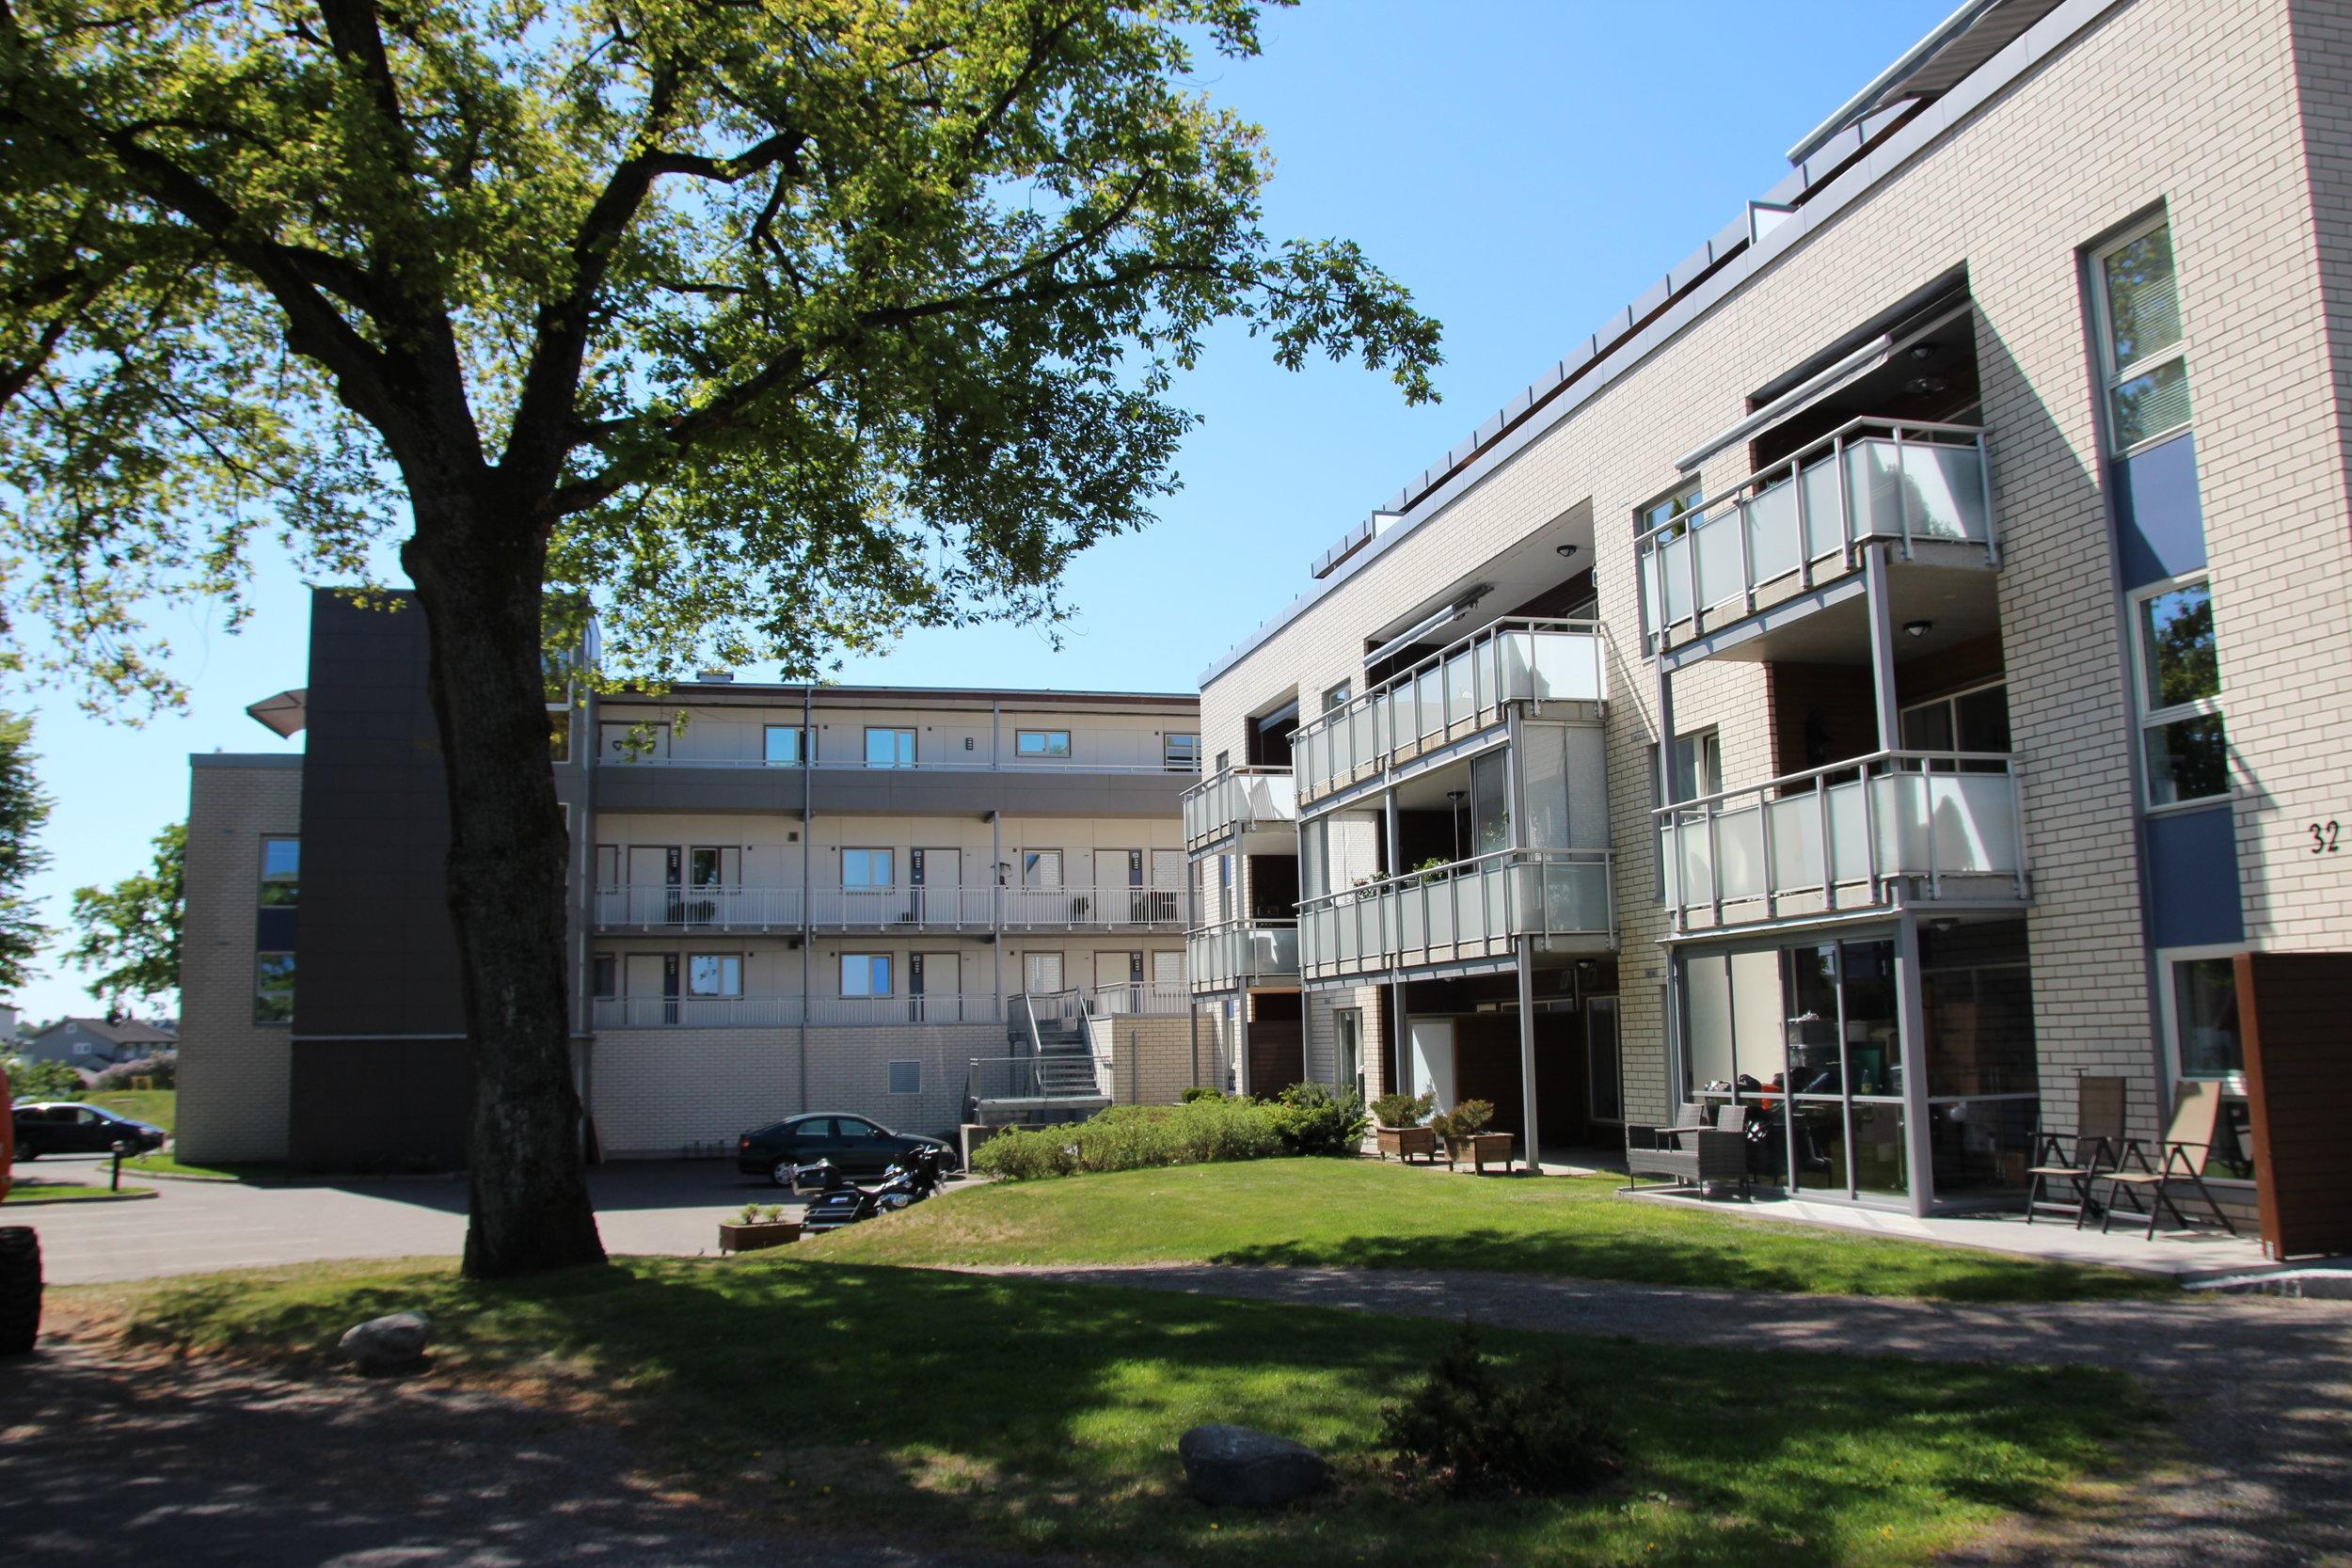 - ReArkitektur v/arkitekt Kristin Lundsør, Håvard Trosterud, m.m.